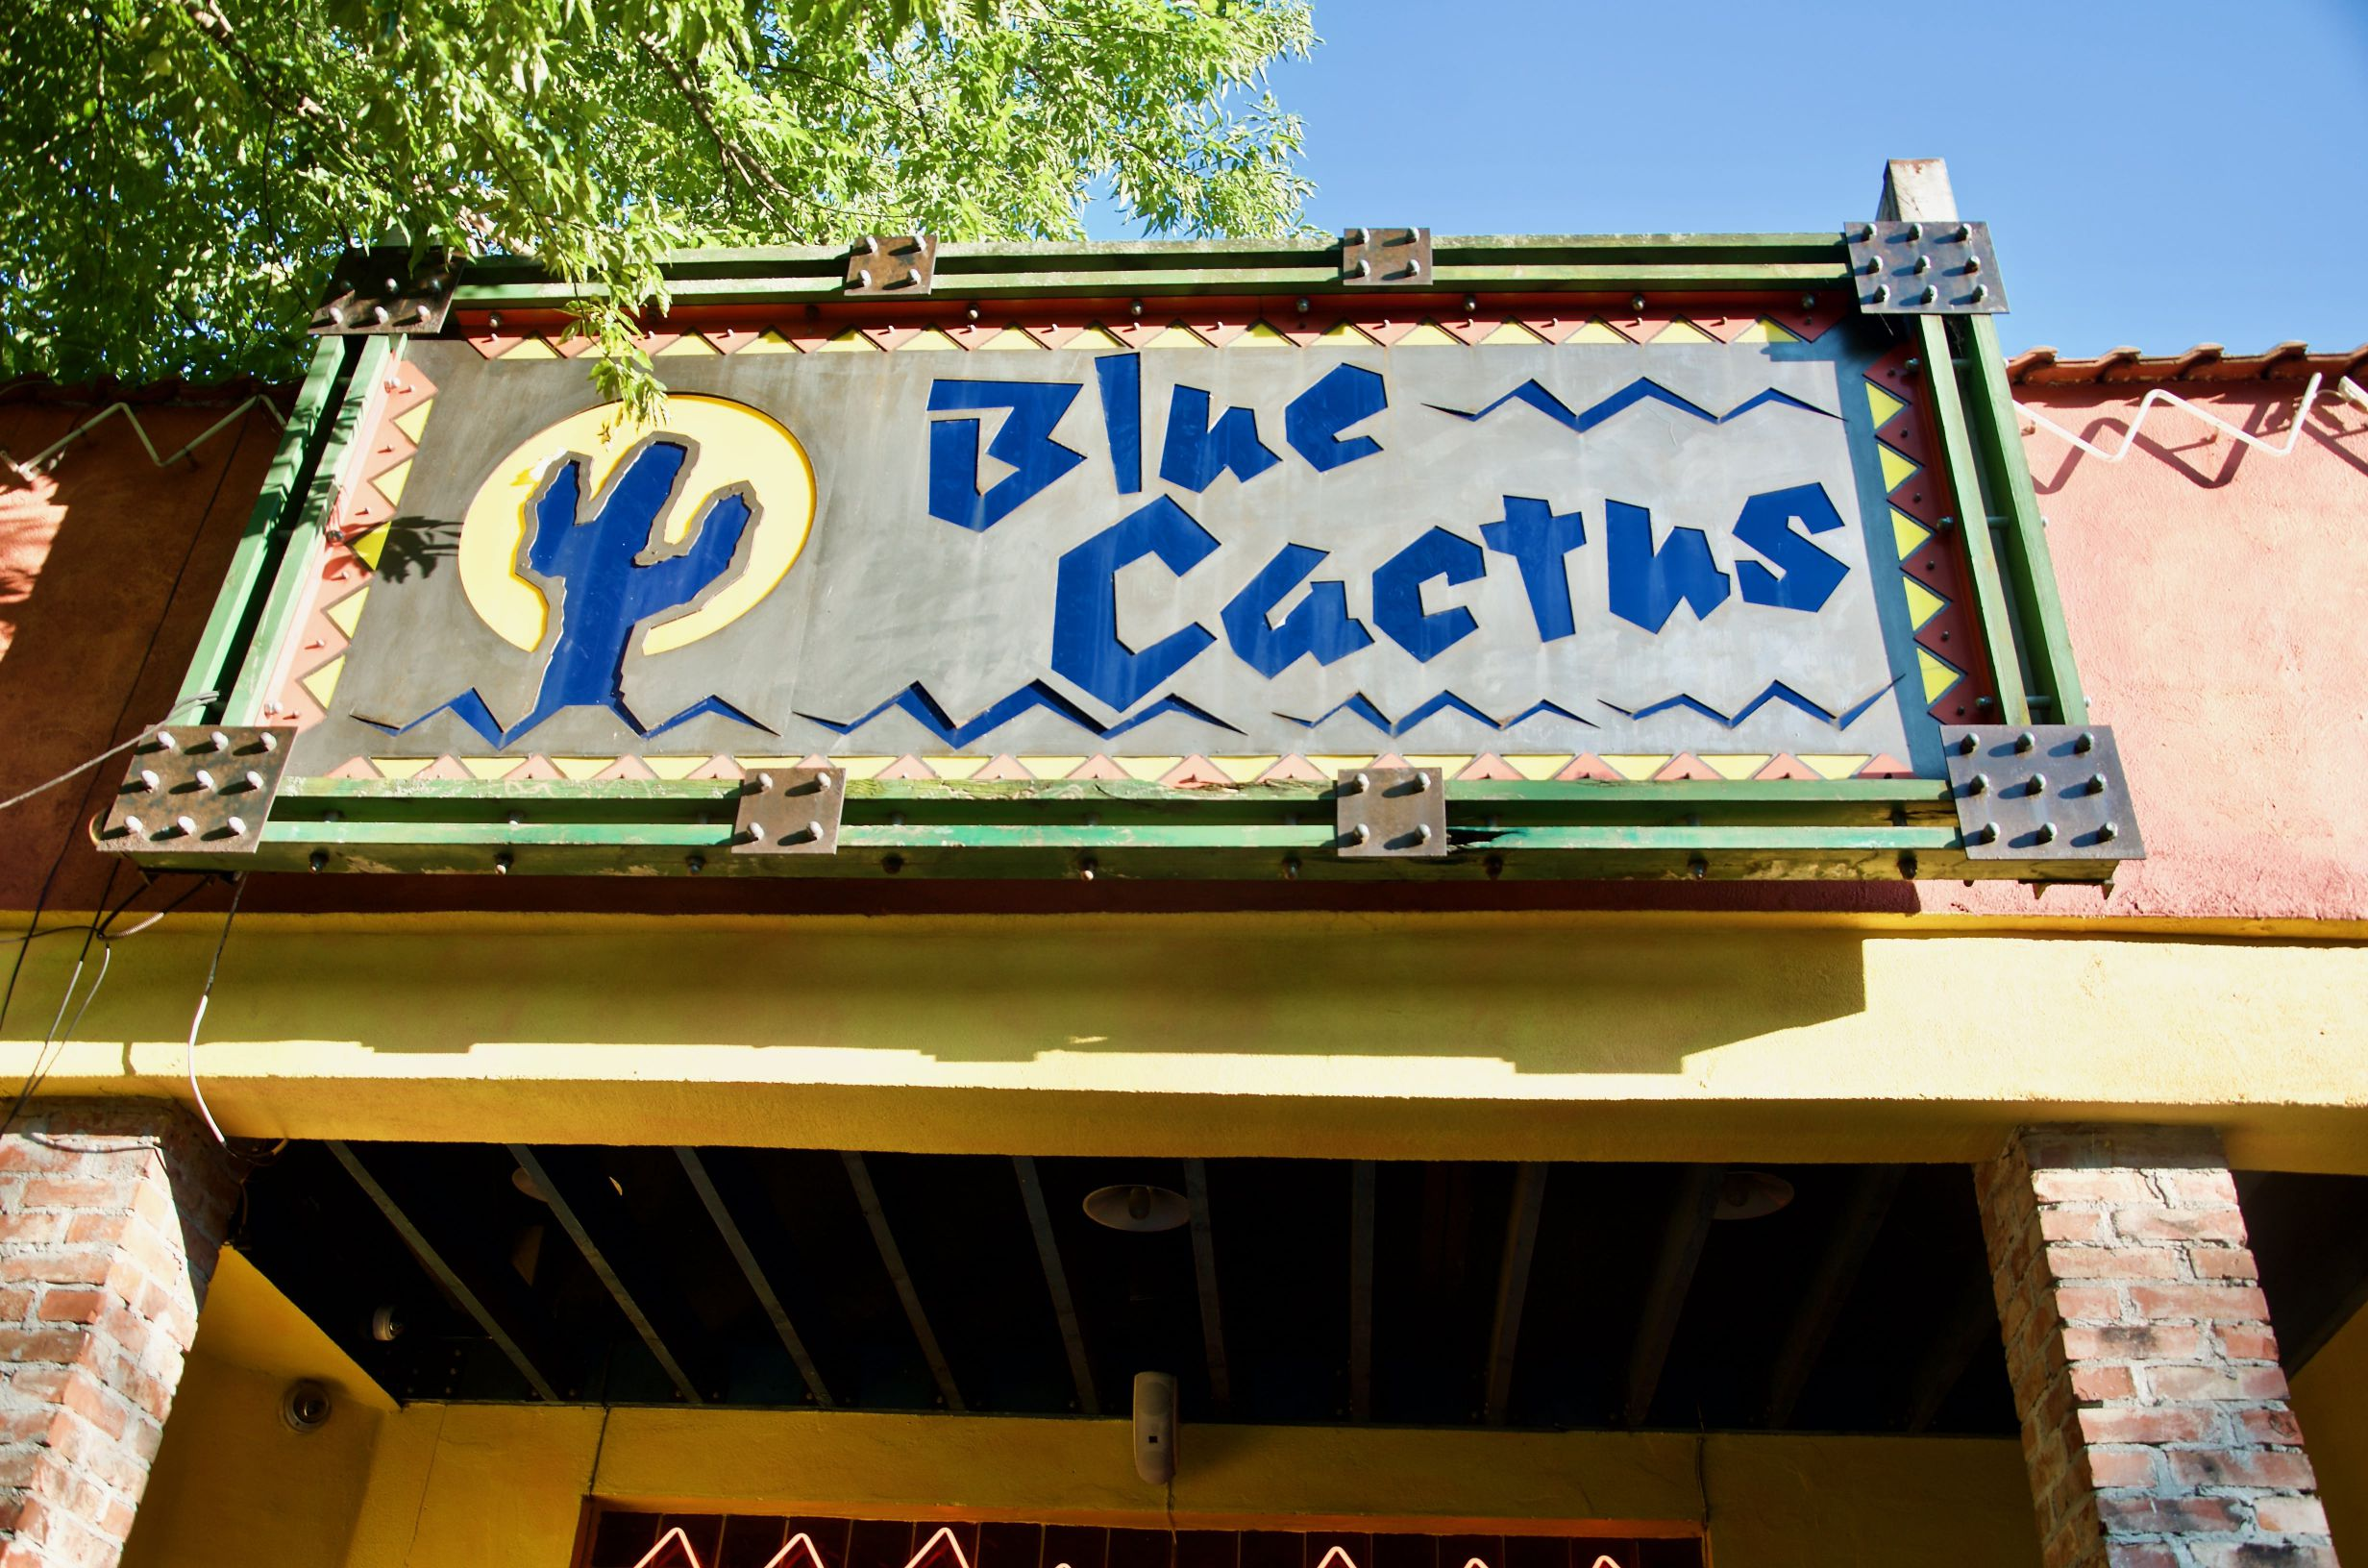 restauracja Blue Cactus